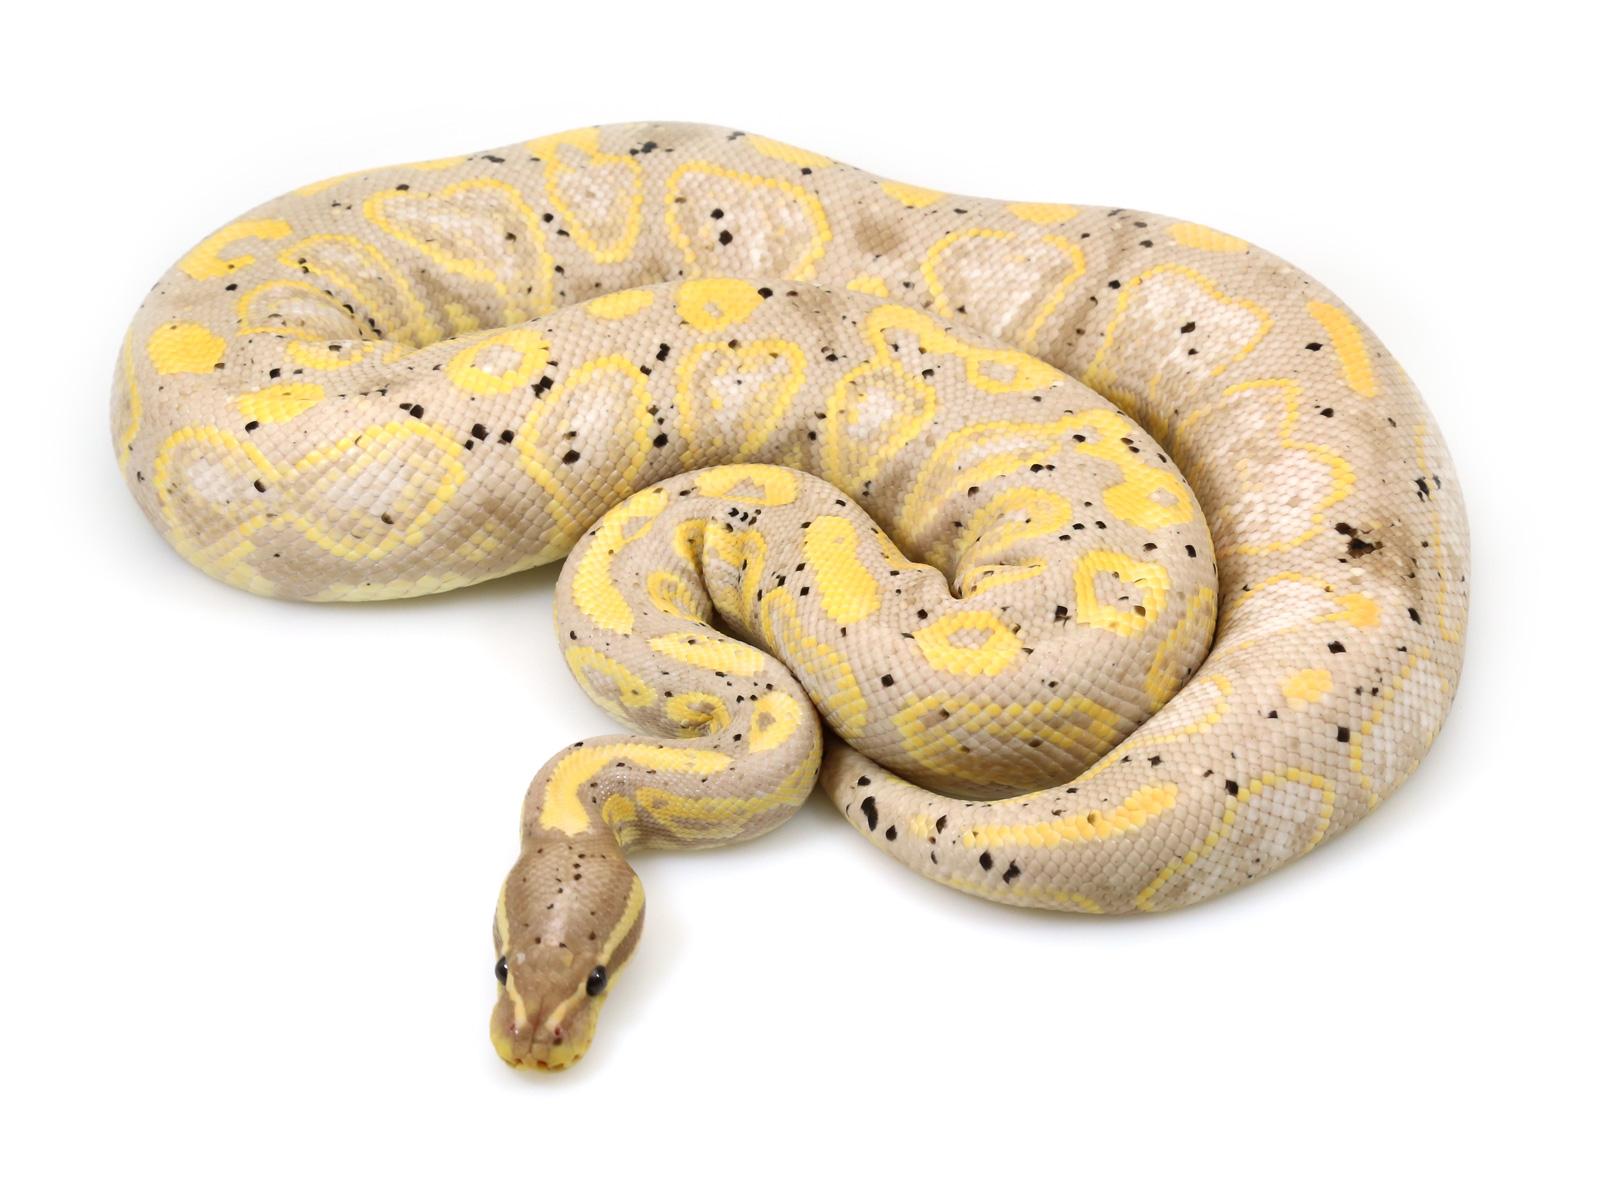 Champagne pied ball python